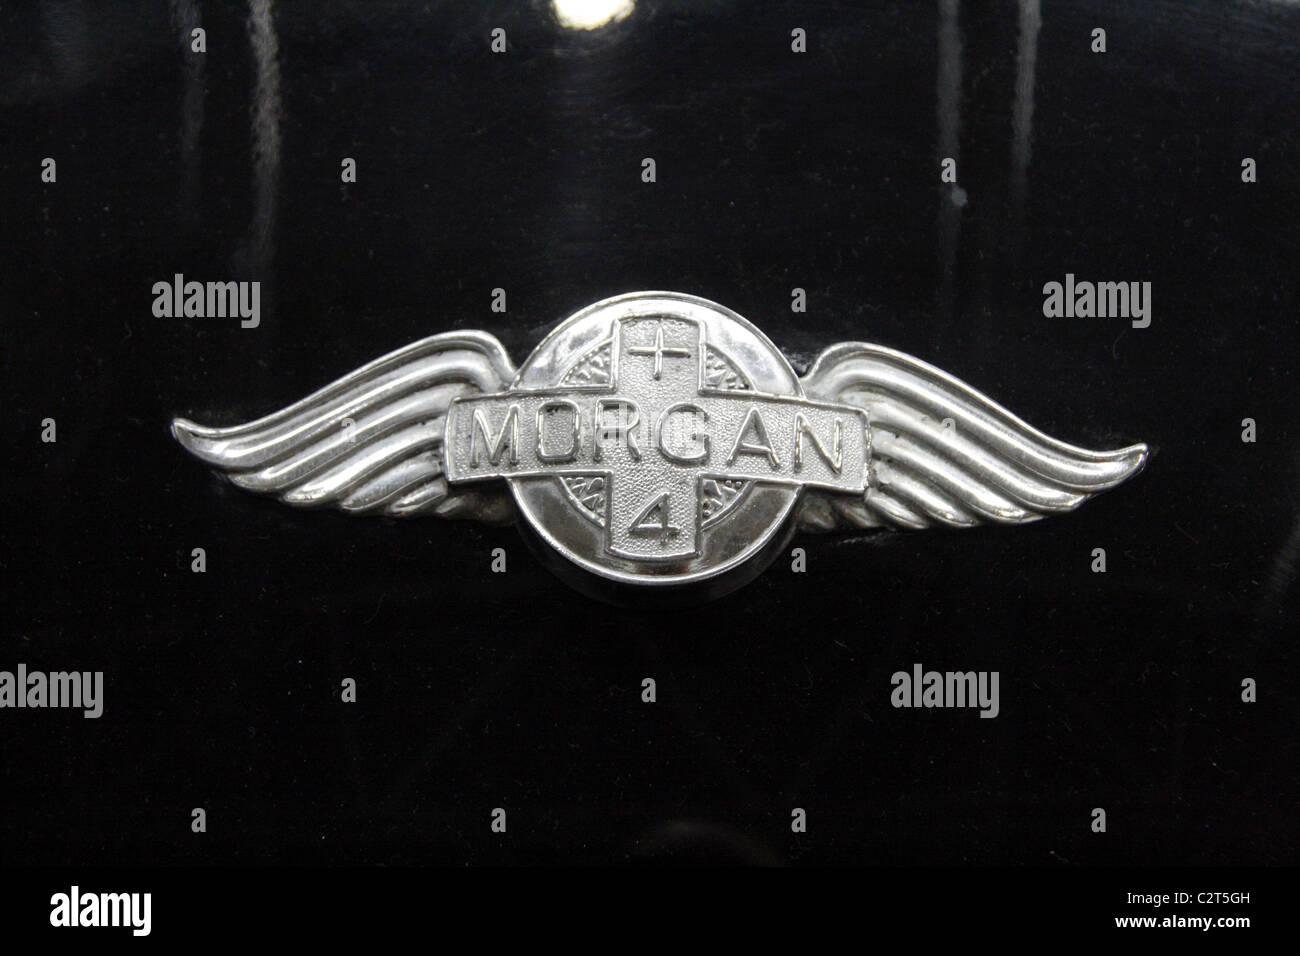 Vintage Black Morgan Sports Car Metal Badge Symbol At Motor Show